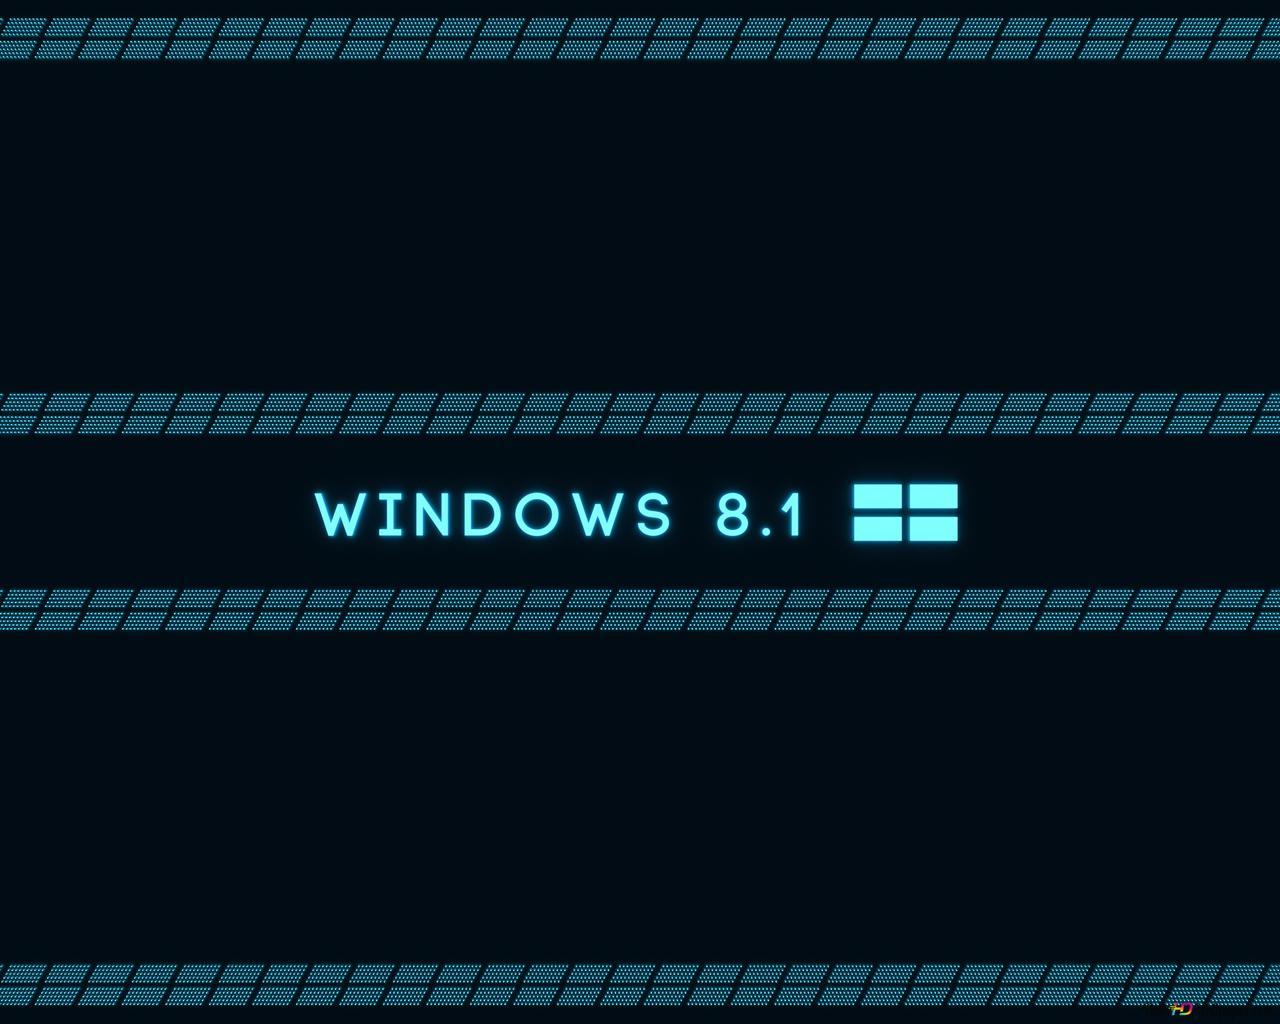 Windows 8 1 Hd Wallpaper Download